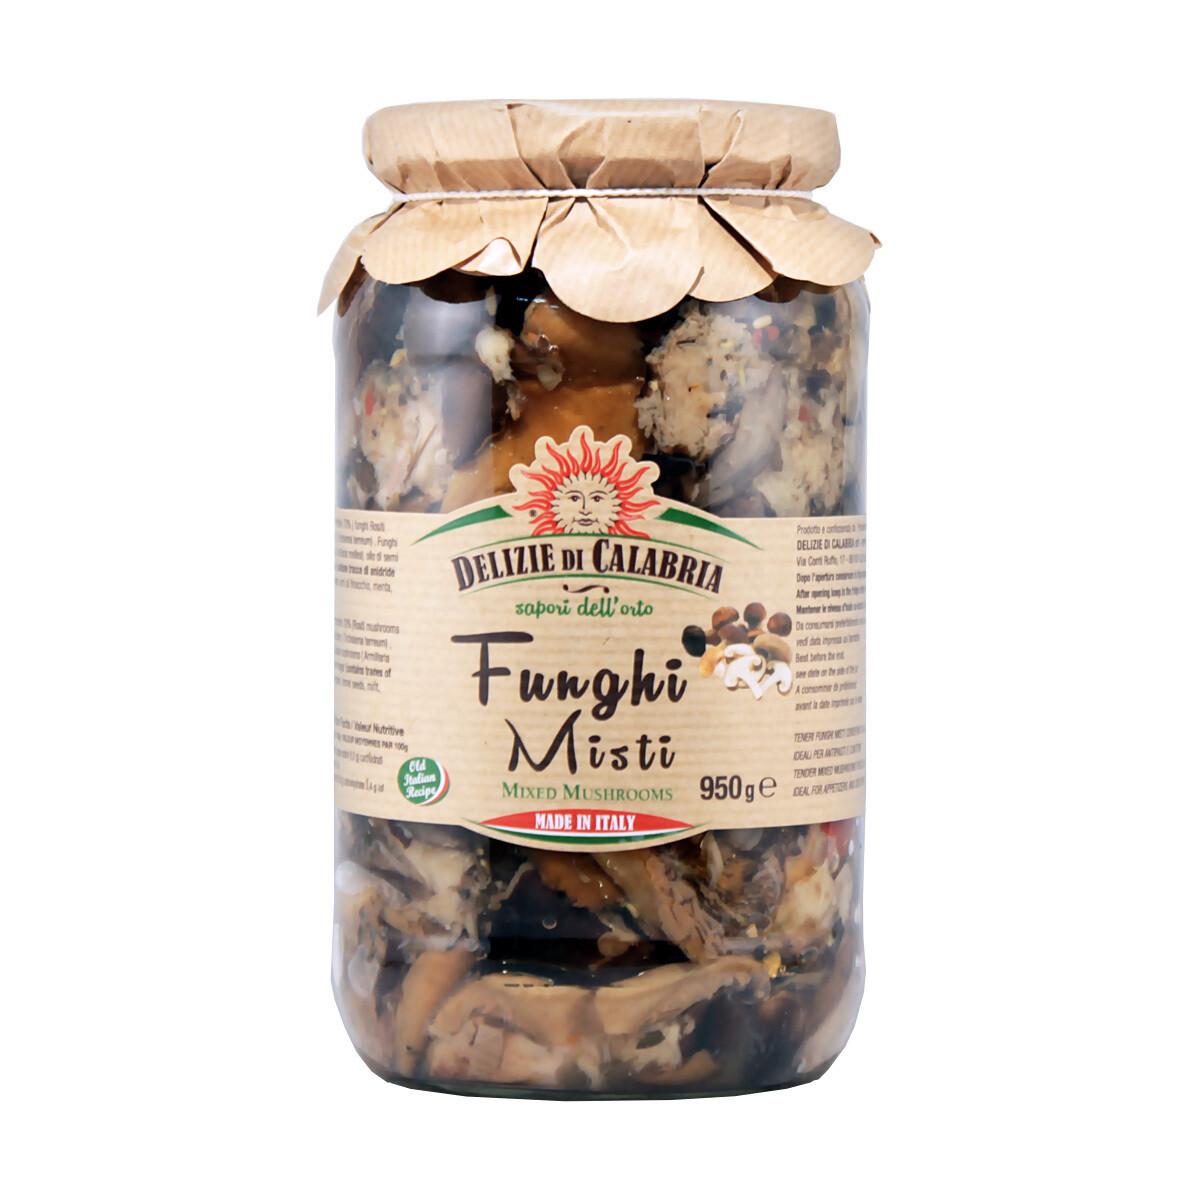 Sekoitetut Calabrialaiset Sienet | Mixed Calabrian Mushrooms | DELIZIE DI CALABRIA | 950 g